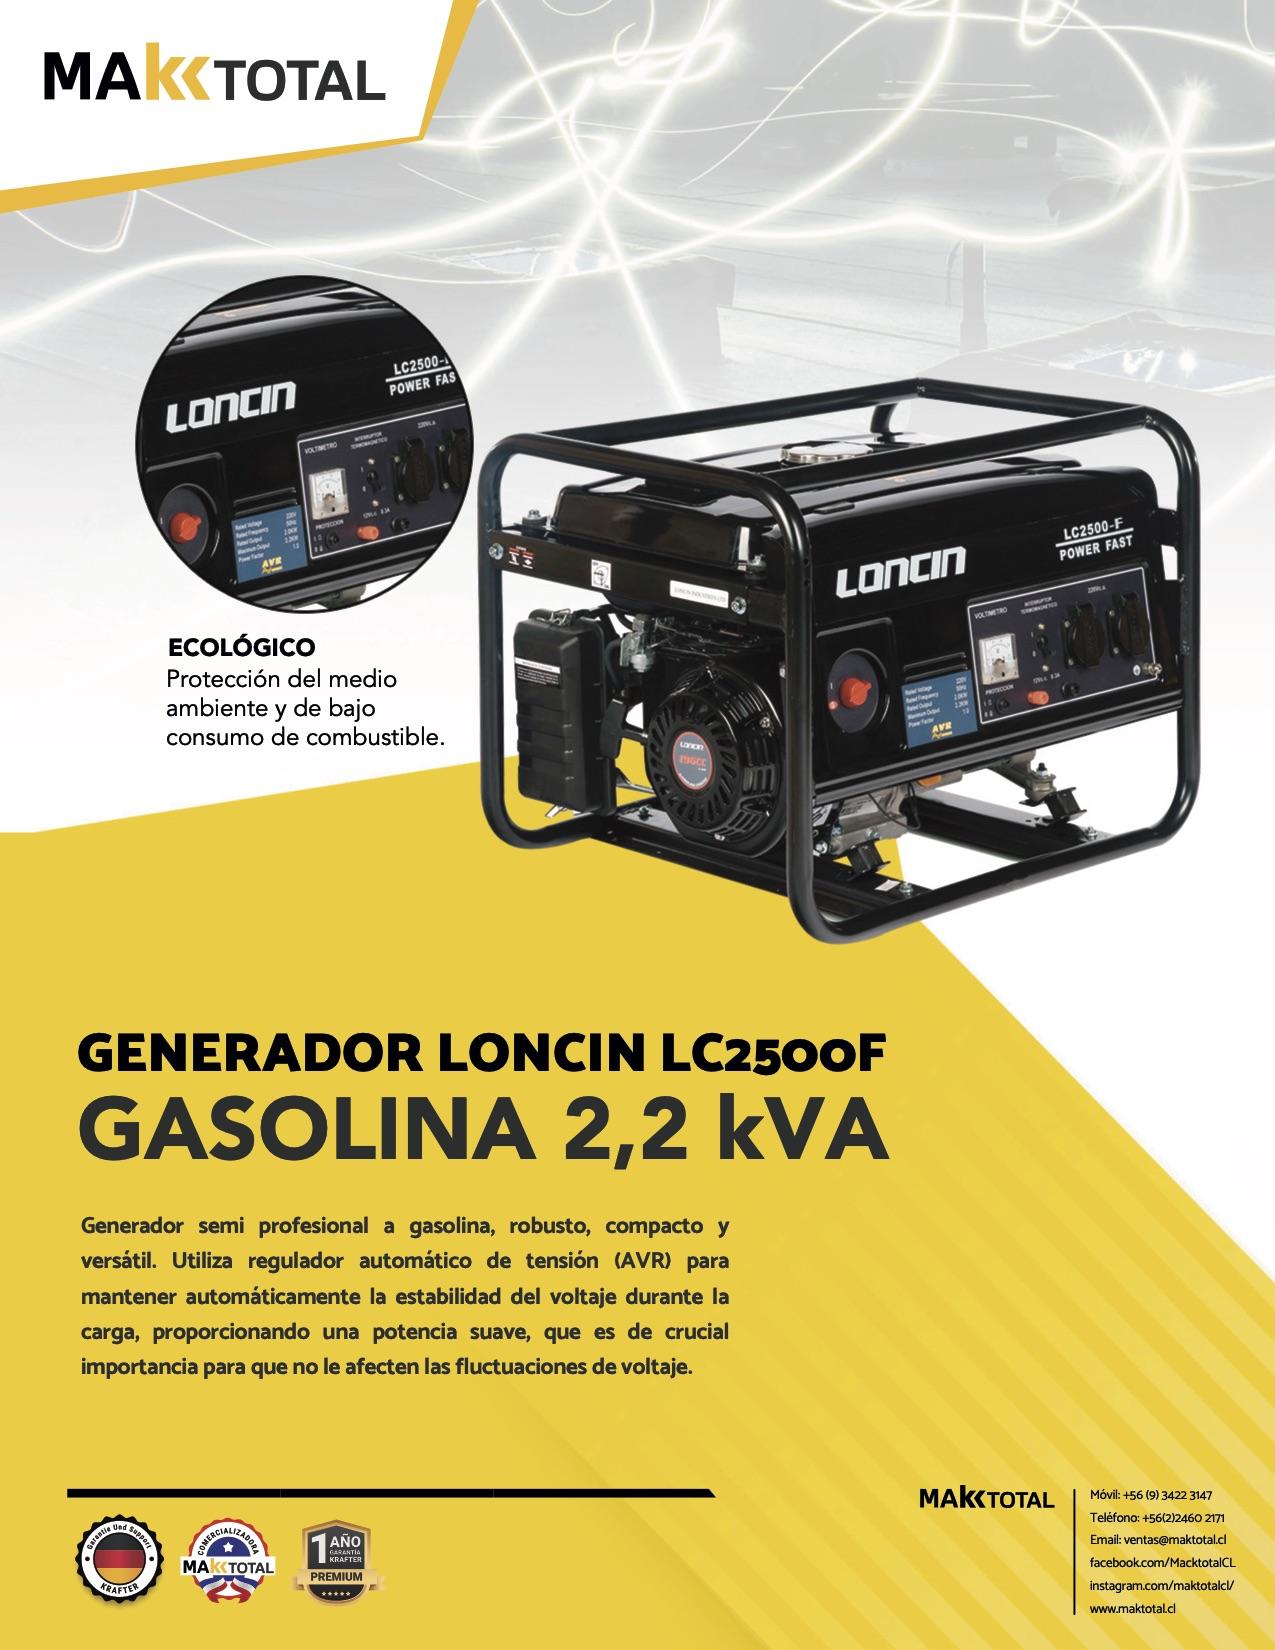 Generador Gasolina 2,2 KVA Loncin